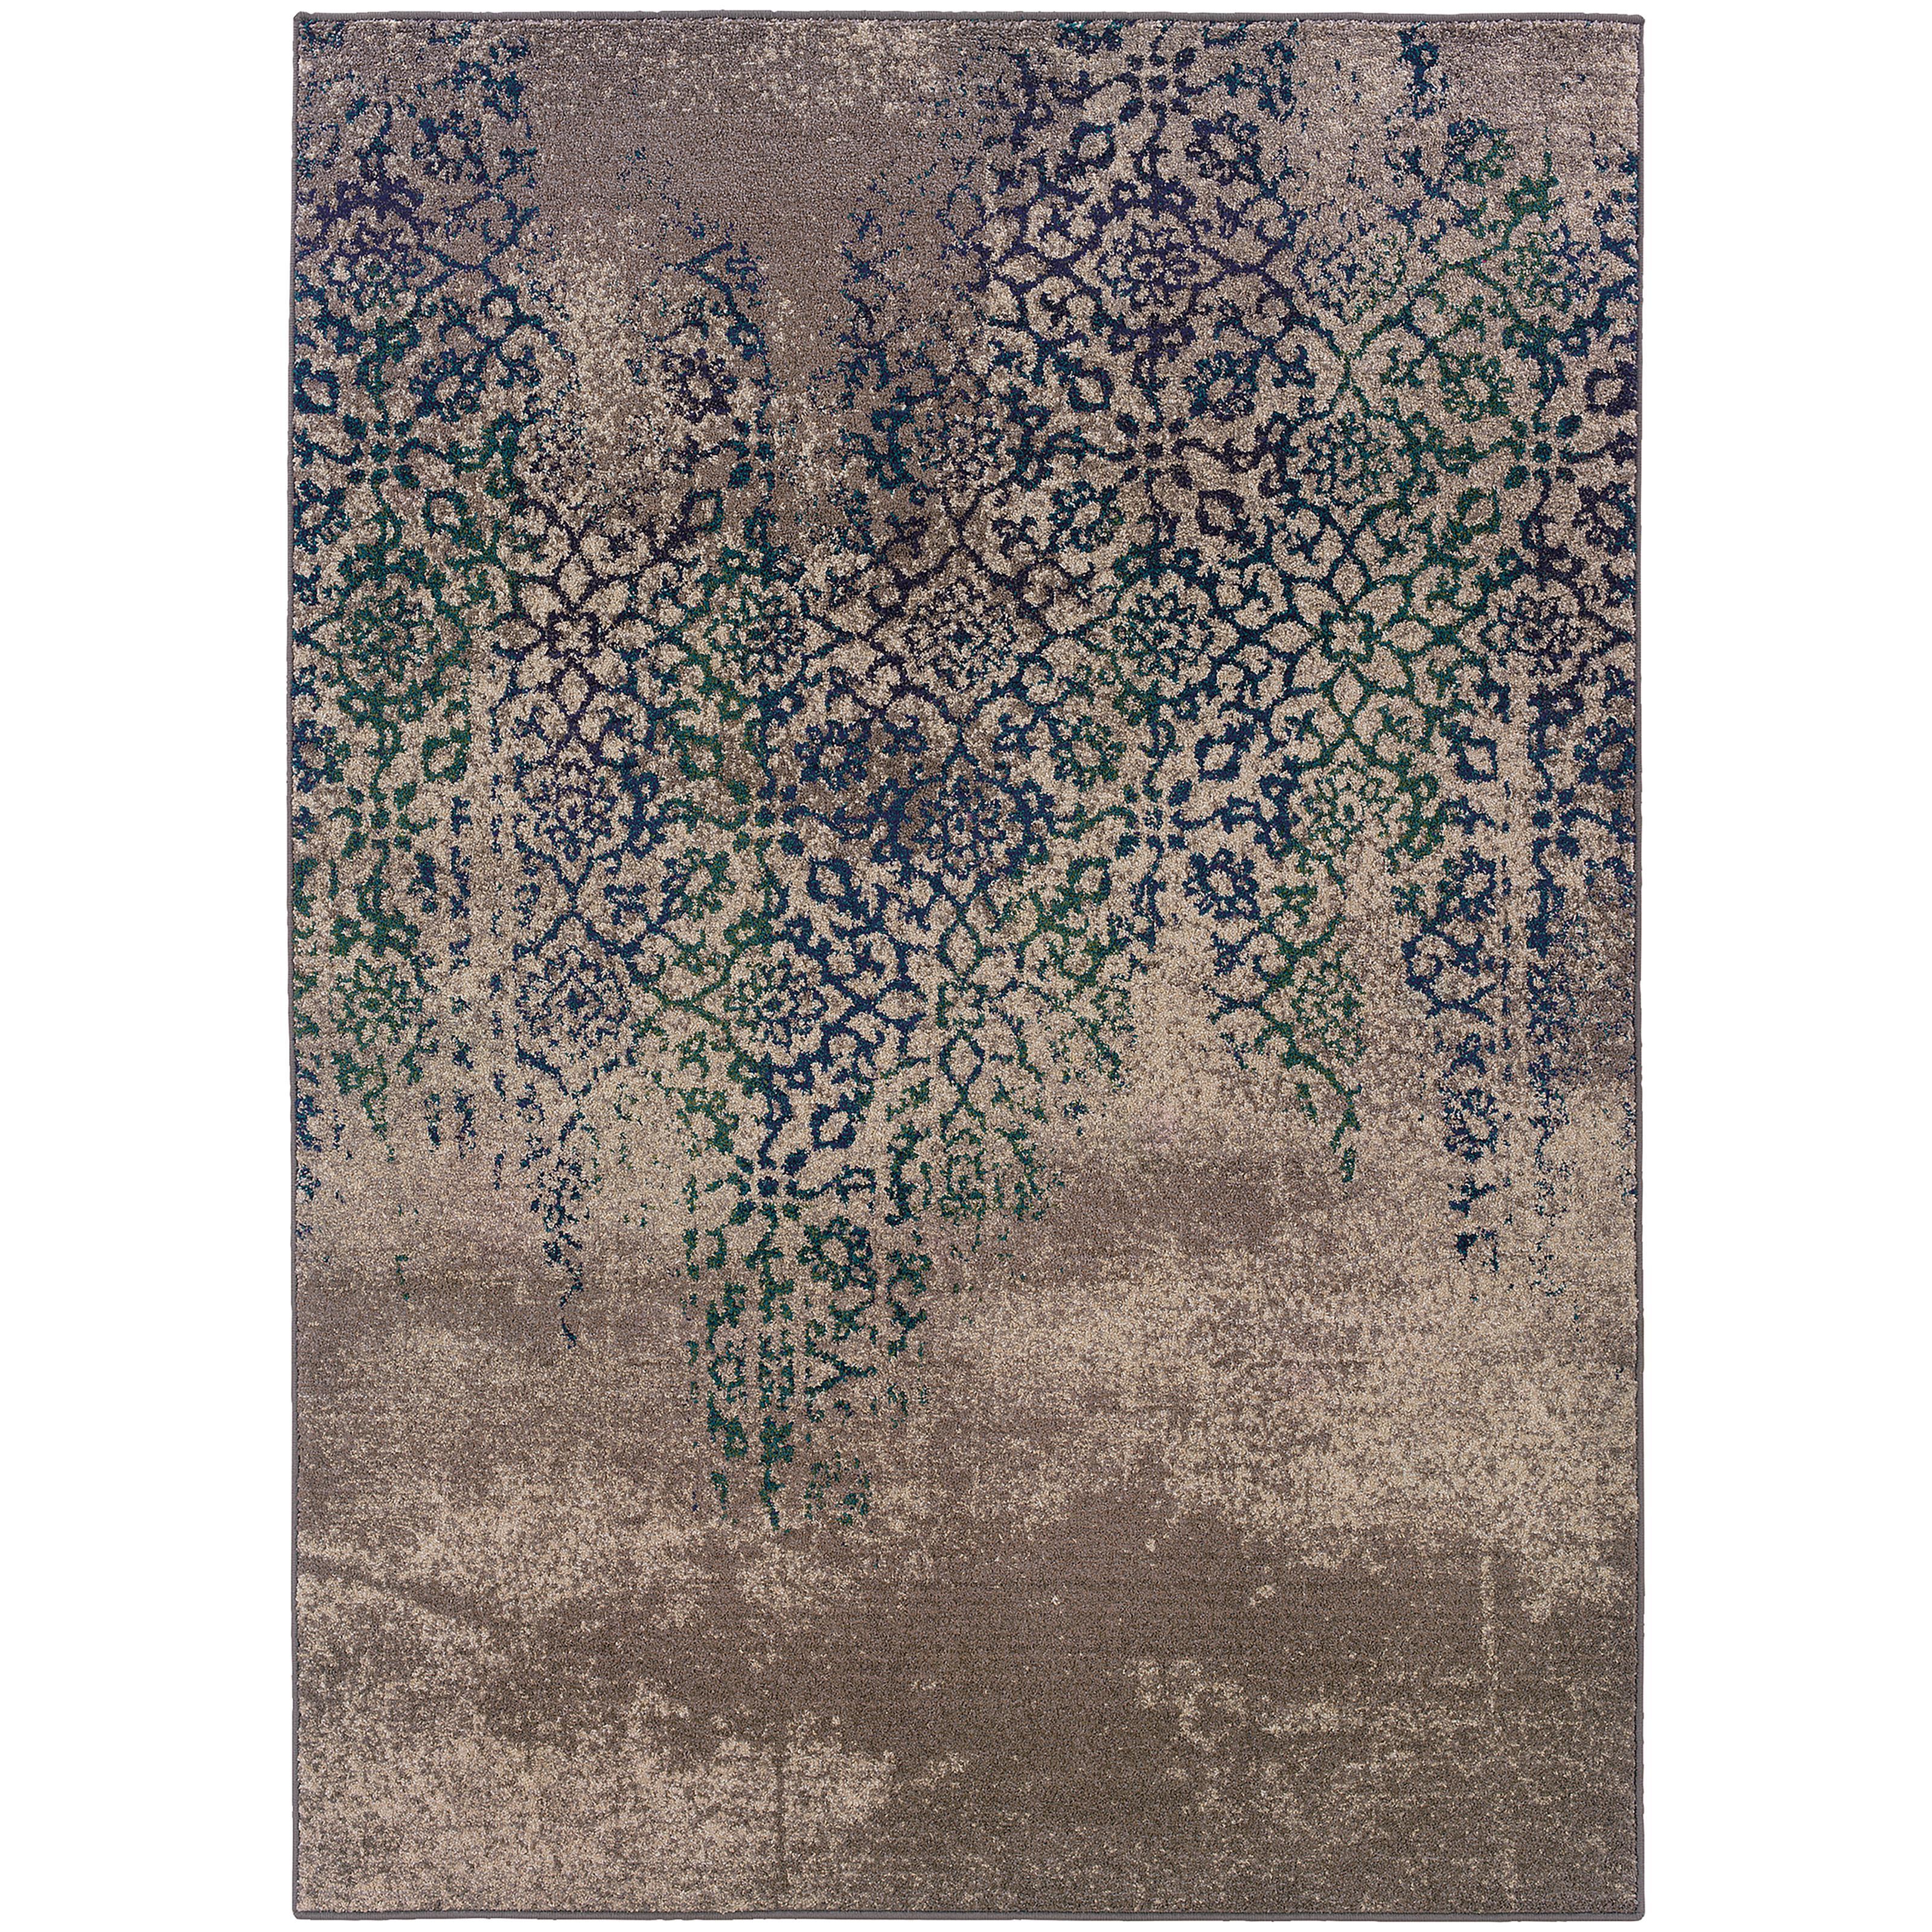 "Oriental Weavers Kaleidoscope 9' 9"" X 12' 2"" Rug - Item Number: K504D5300380ST"